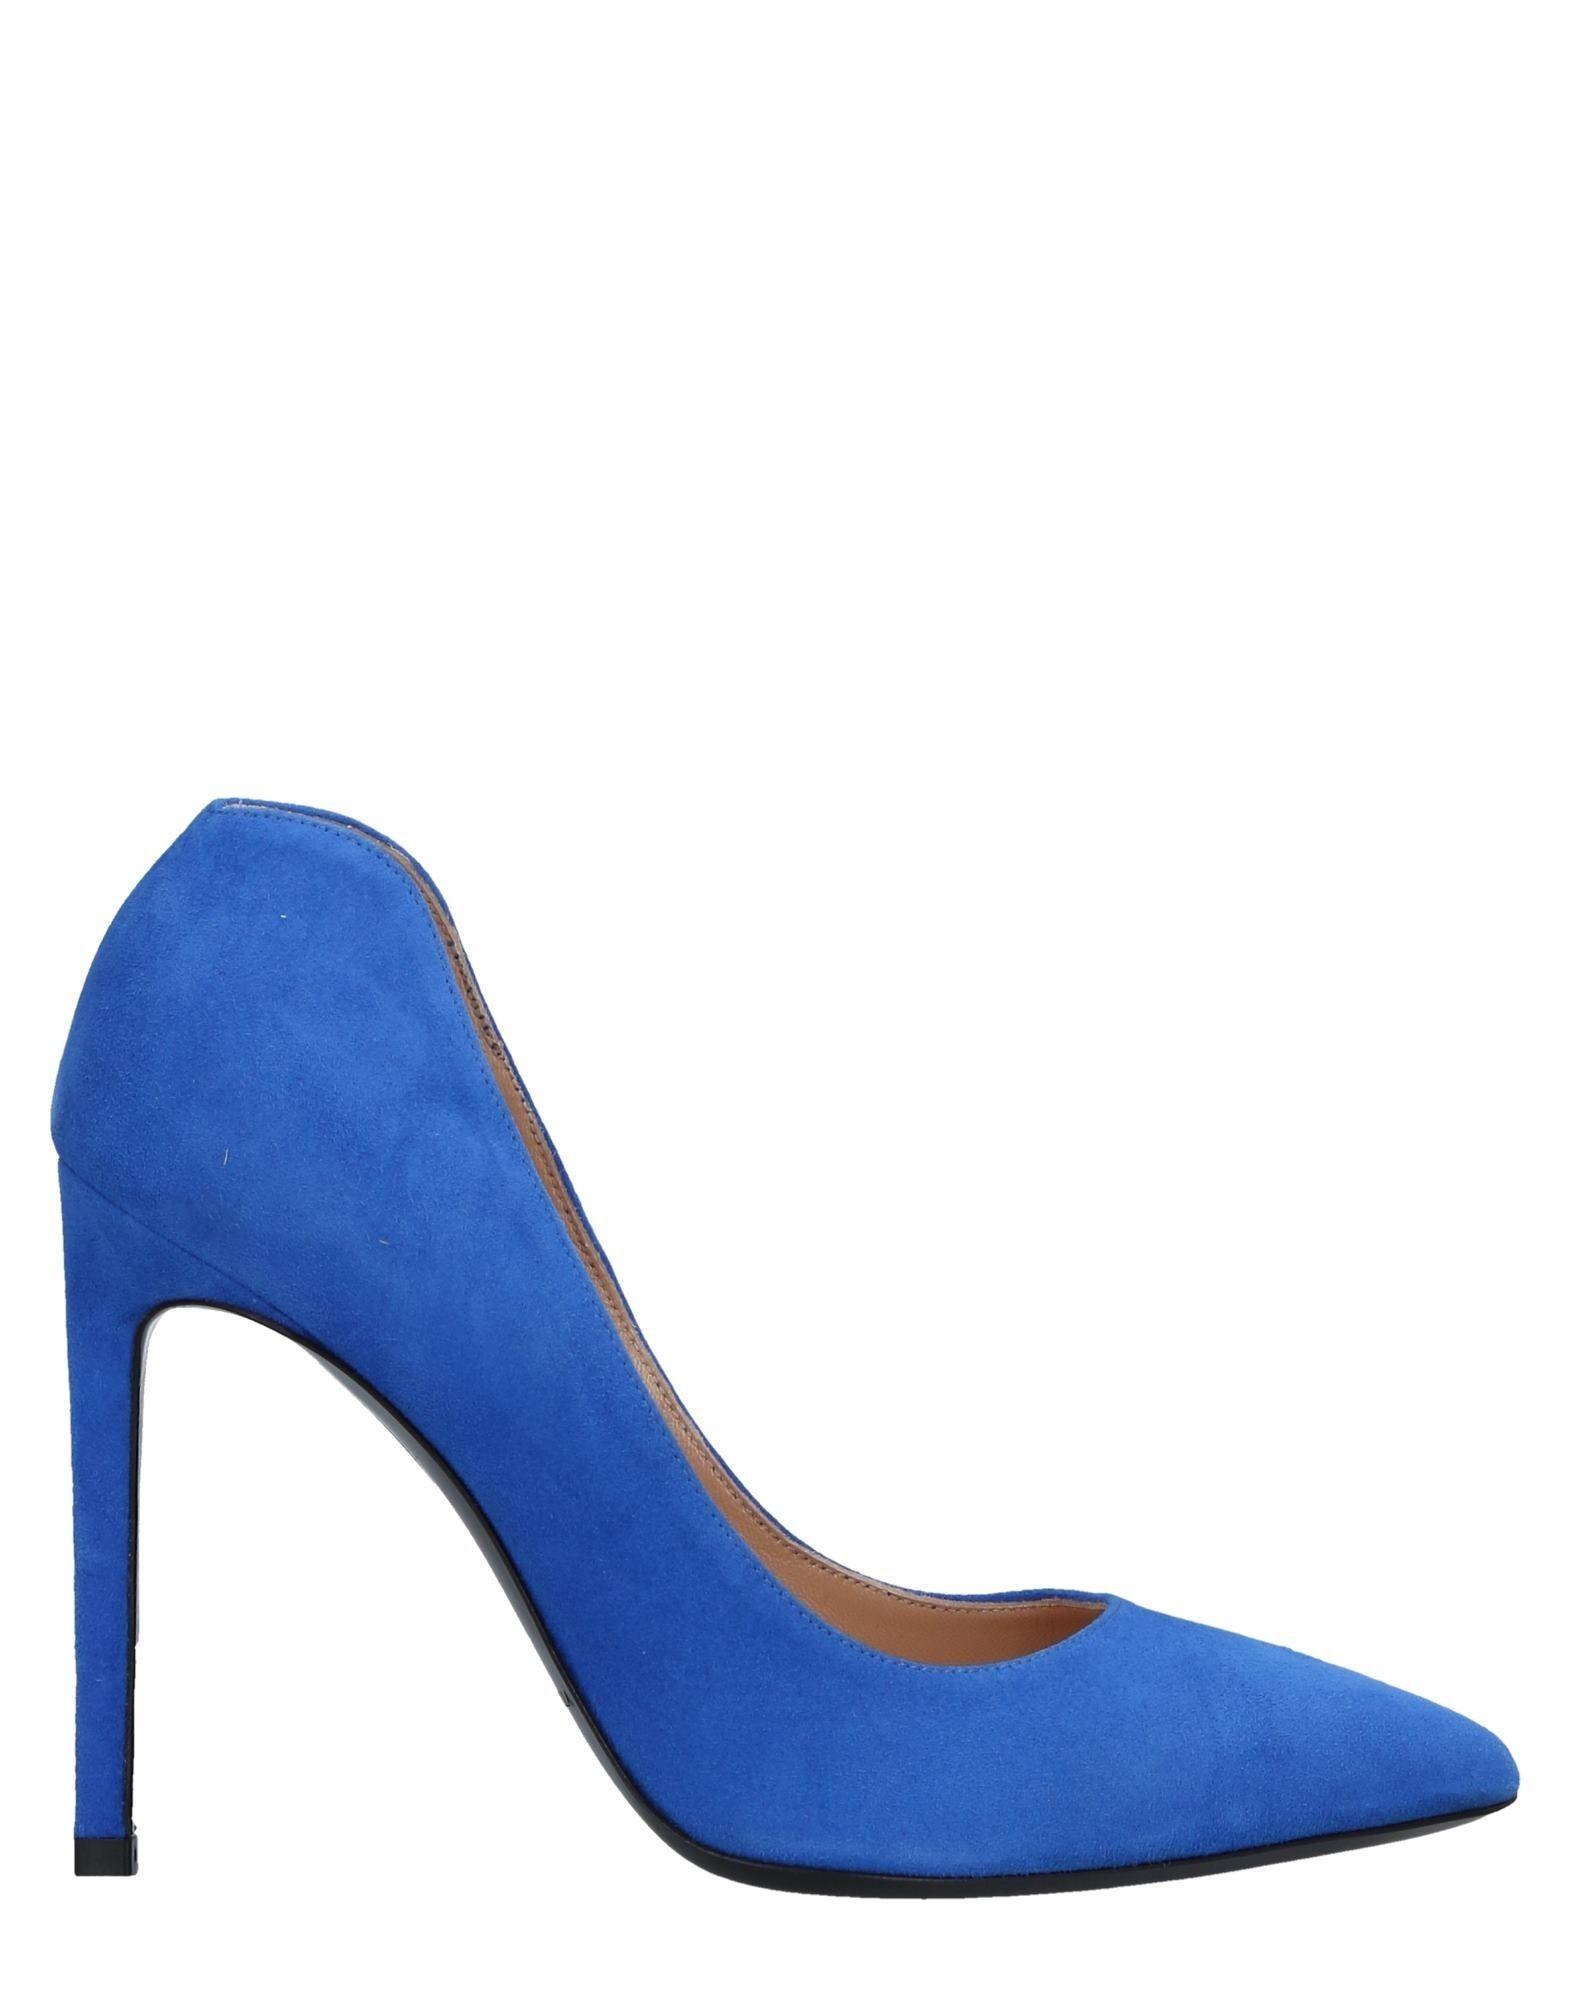 Rabatt Schuhe Marco Barbabella Pumps Damen  11519087JP